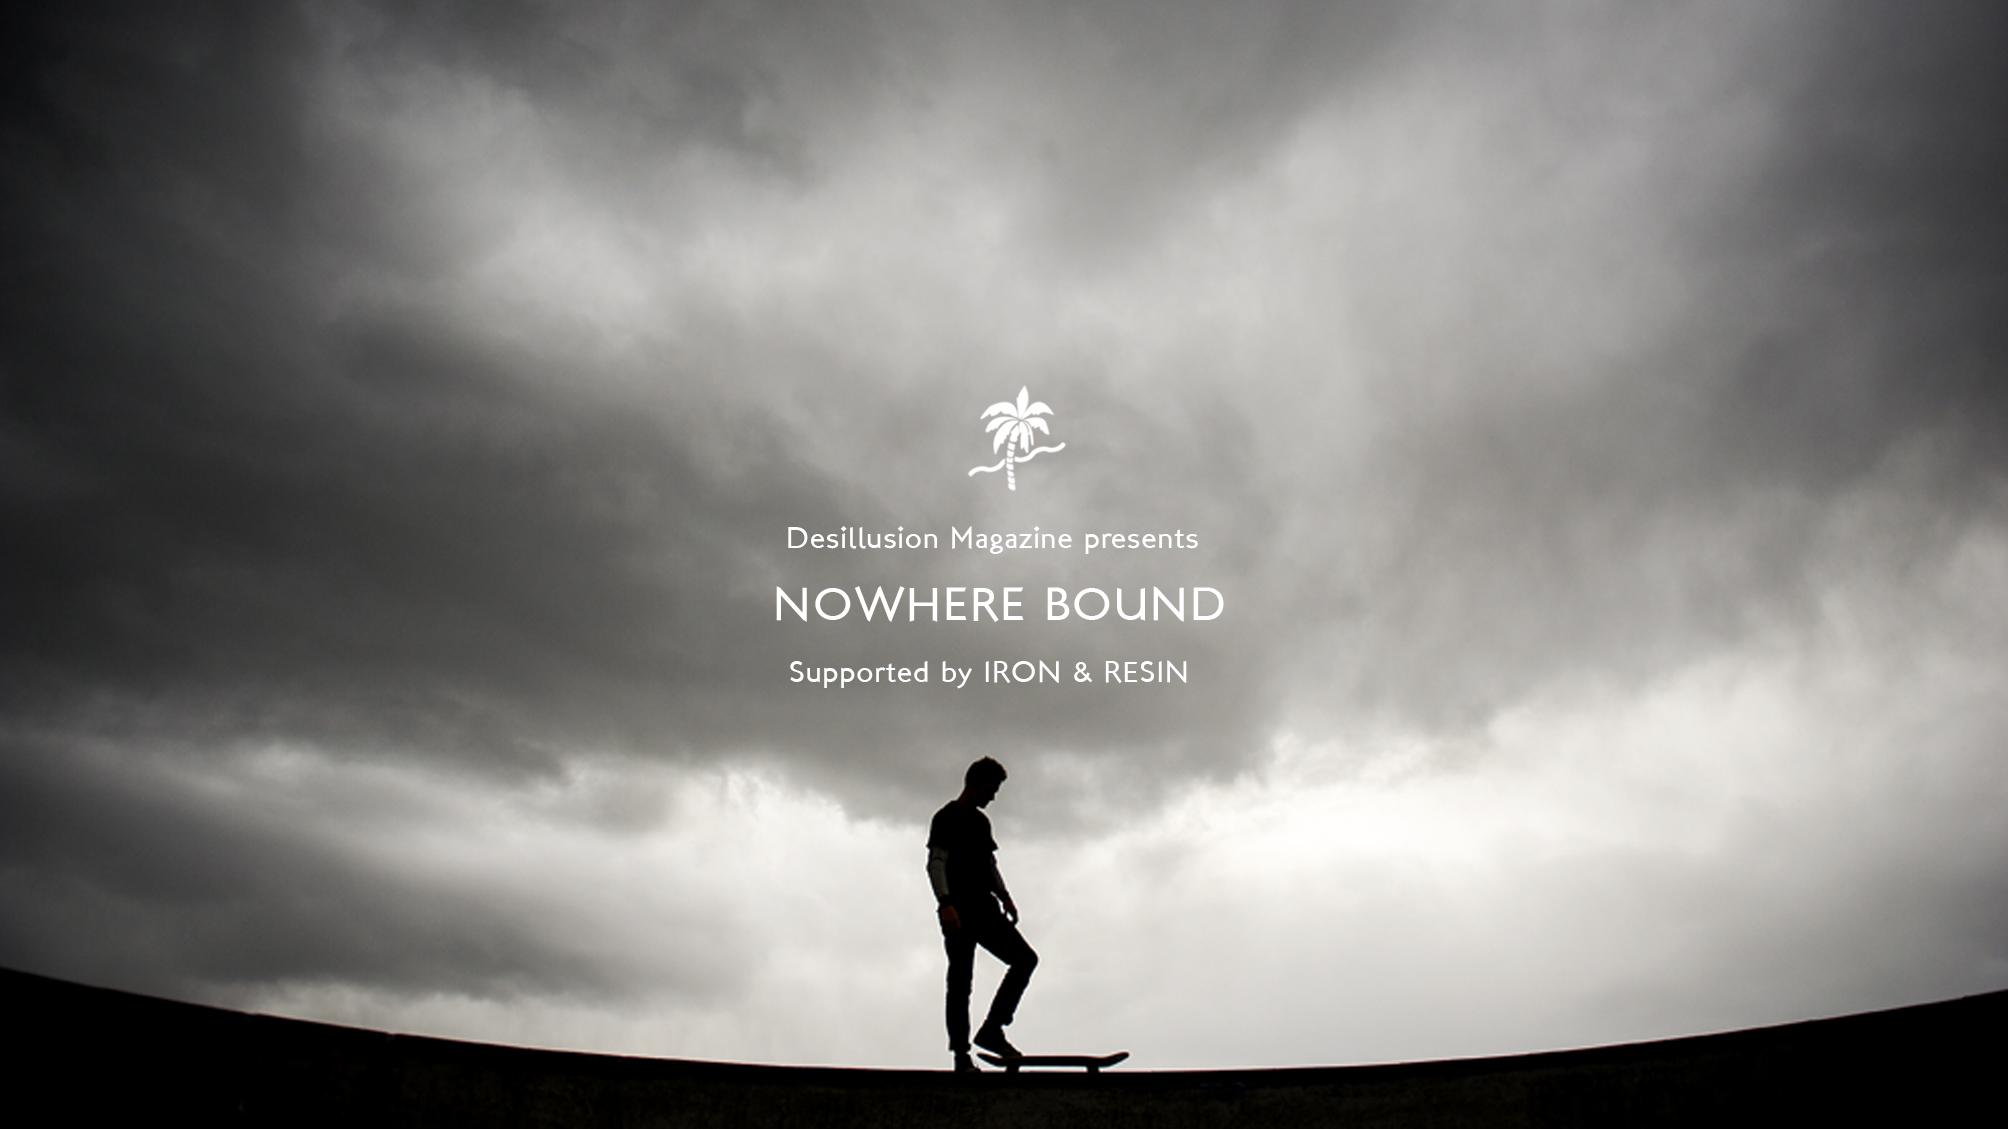 Nowhere Bound